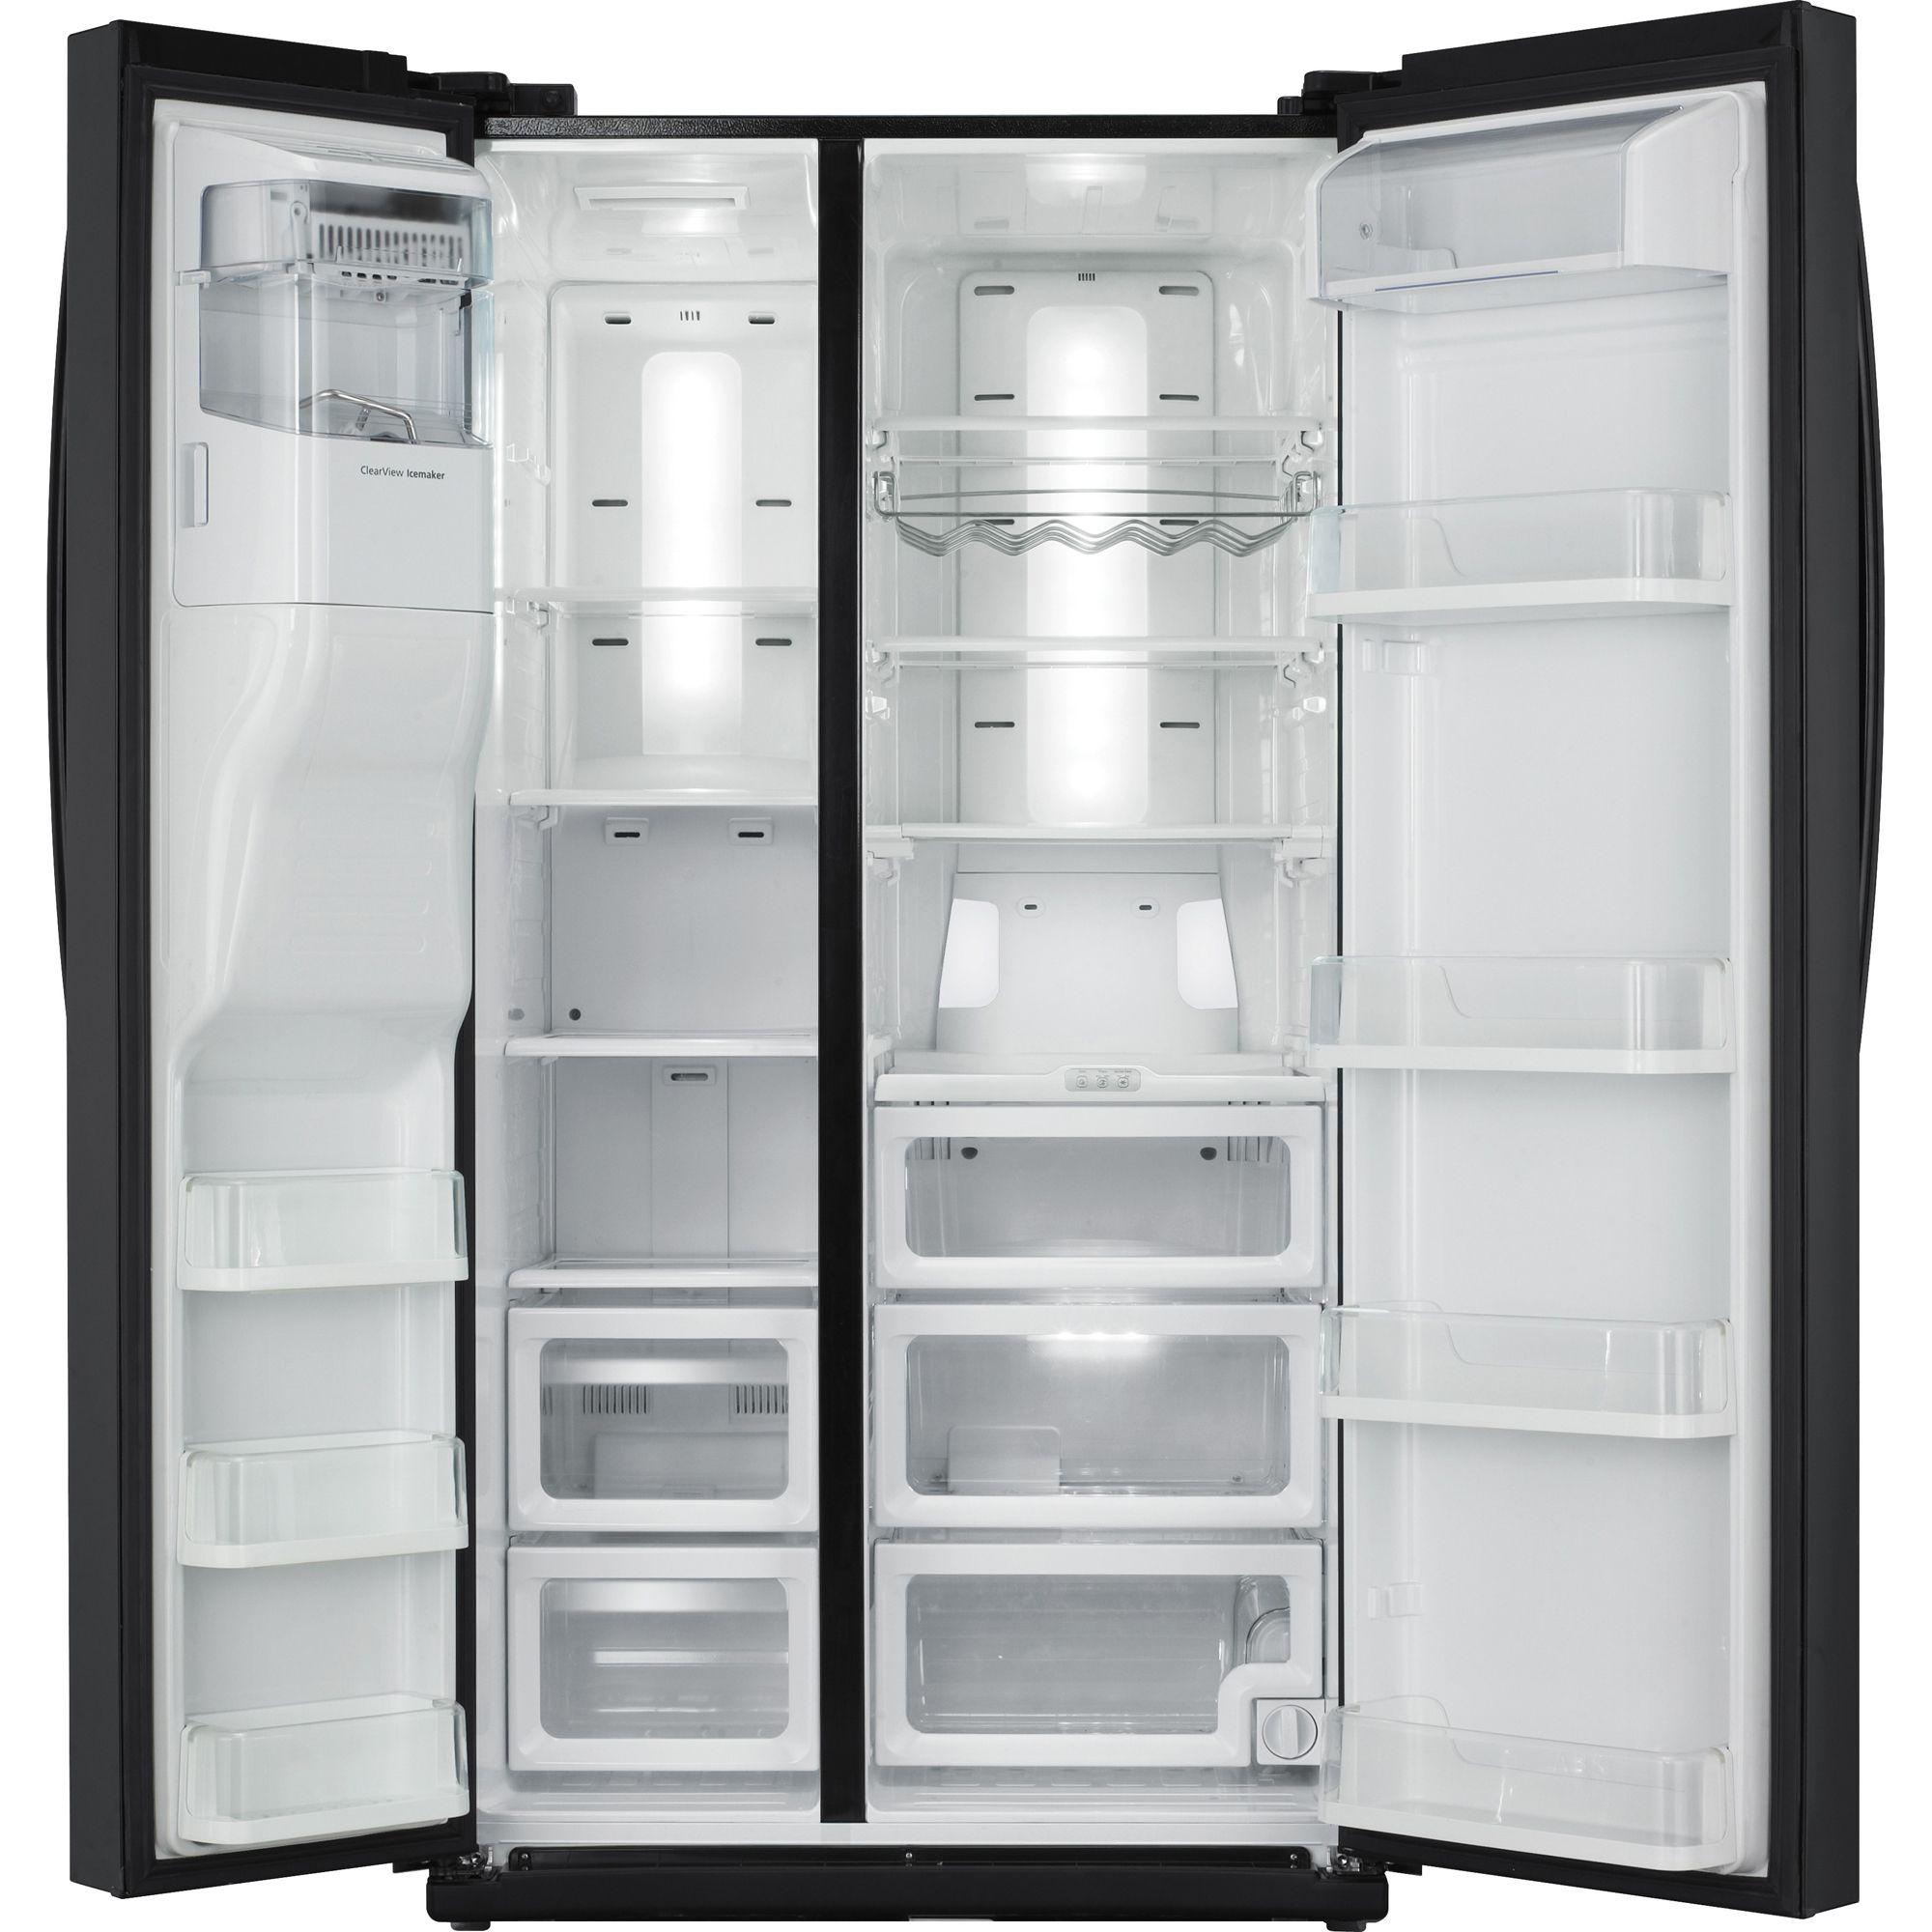 Samsung 25.5 cu. ft. Side-by-Side Refrigerator